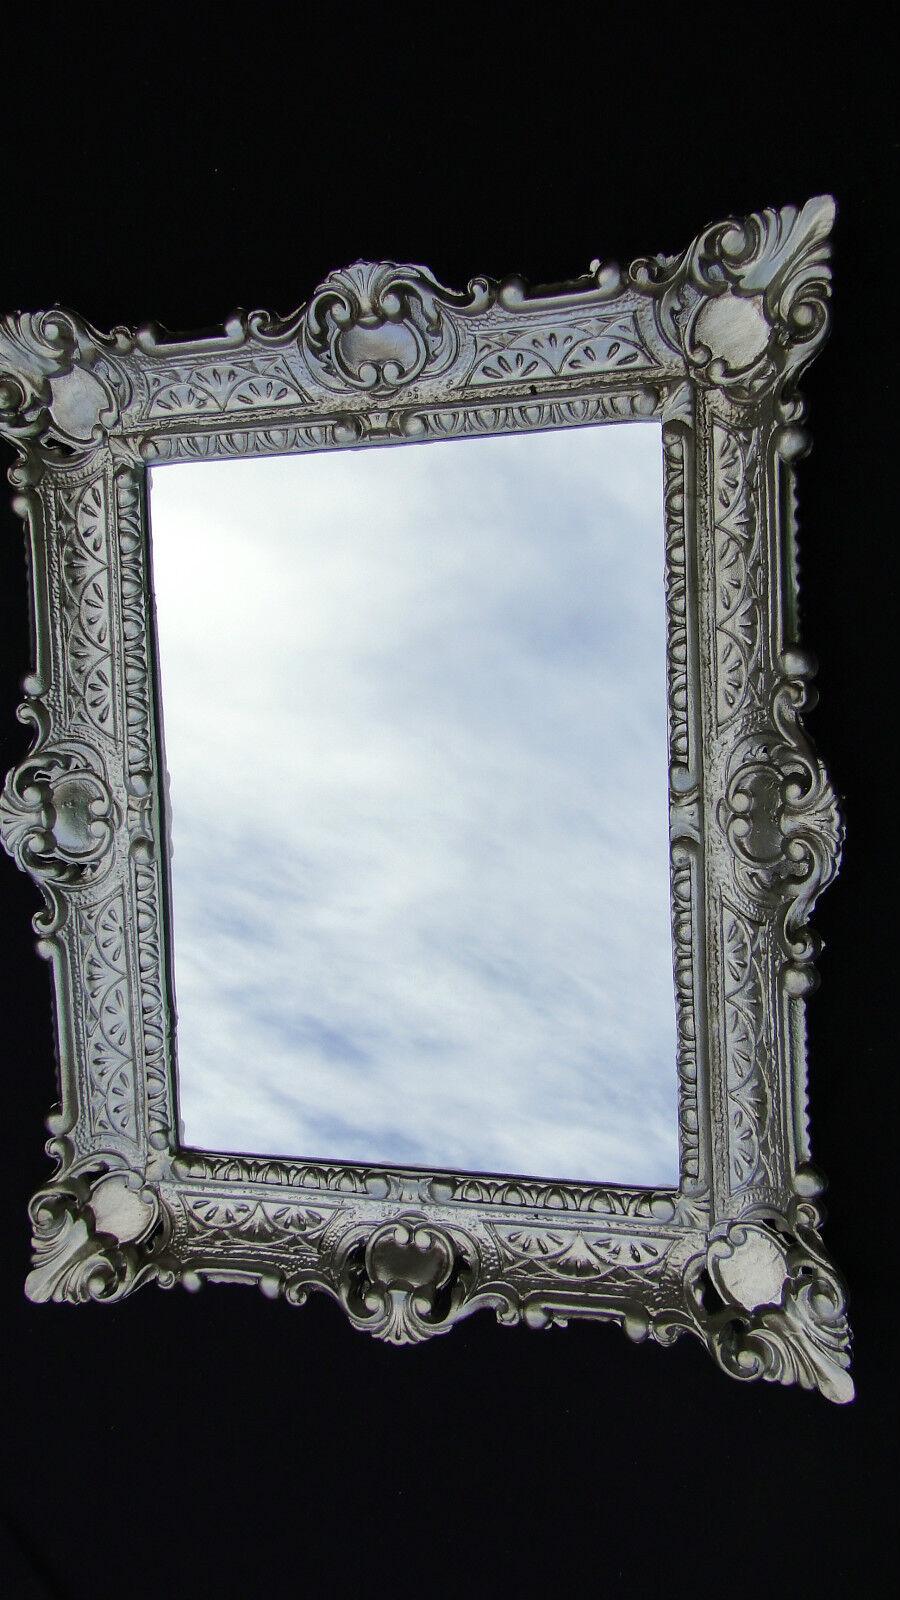 picture frame baroque black silver 56x46 mirror frame rectangular 30x40 retro ebay. Black Bedroom Furniture Sets. Home Design Ideas